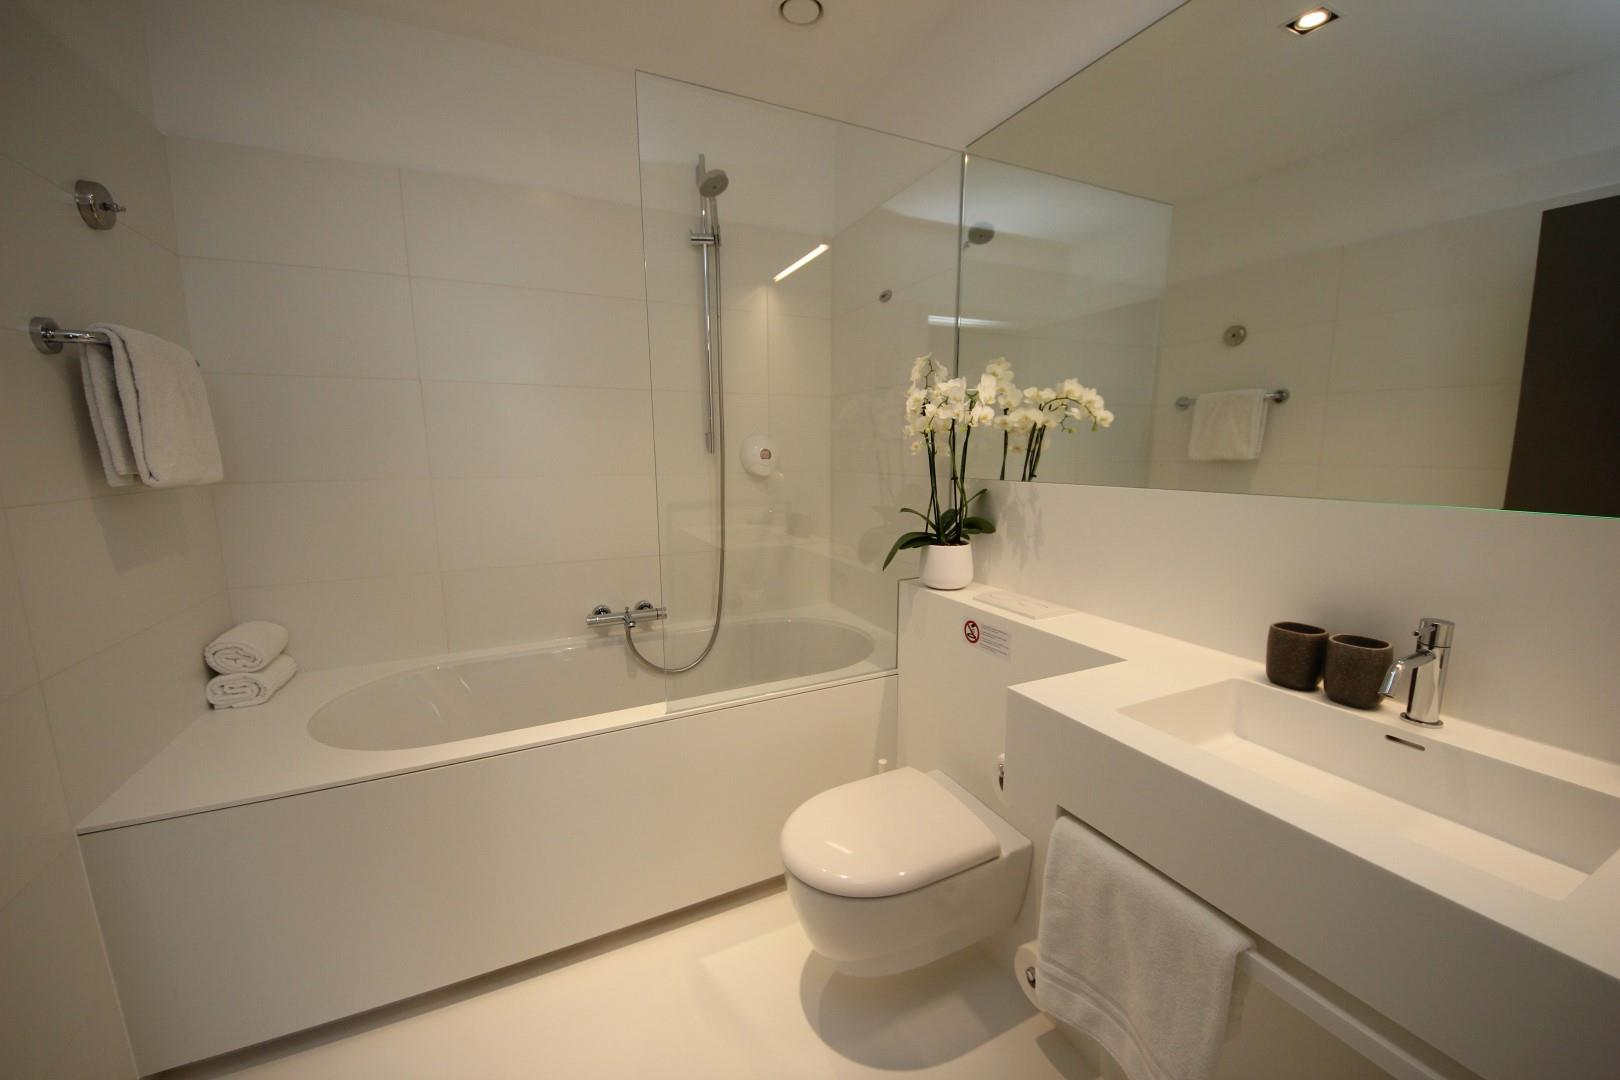 comfy-room-bathroom-1-large.JPG